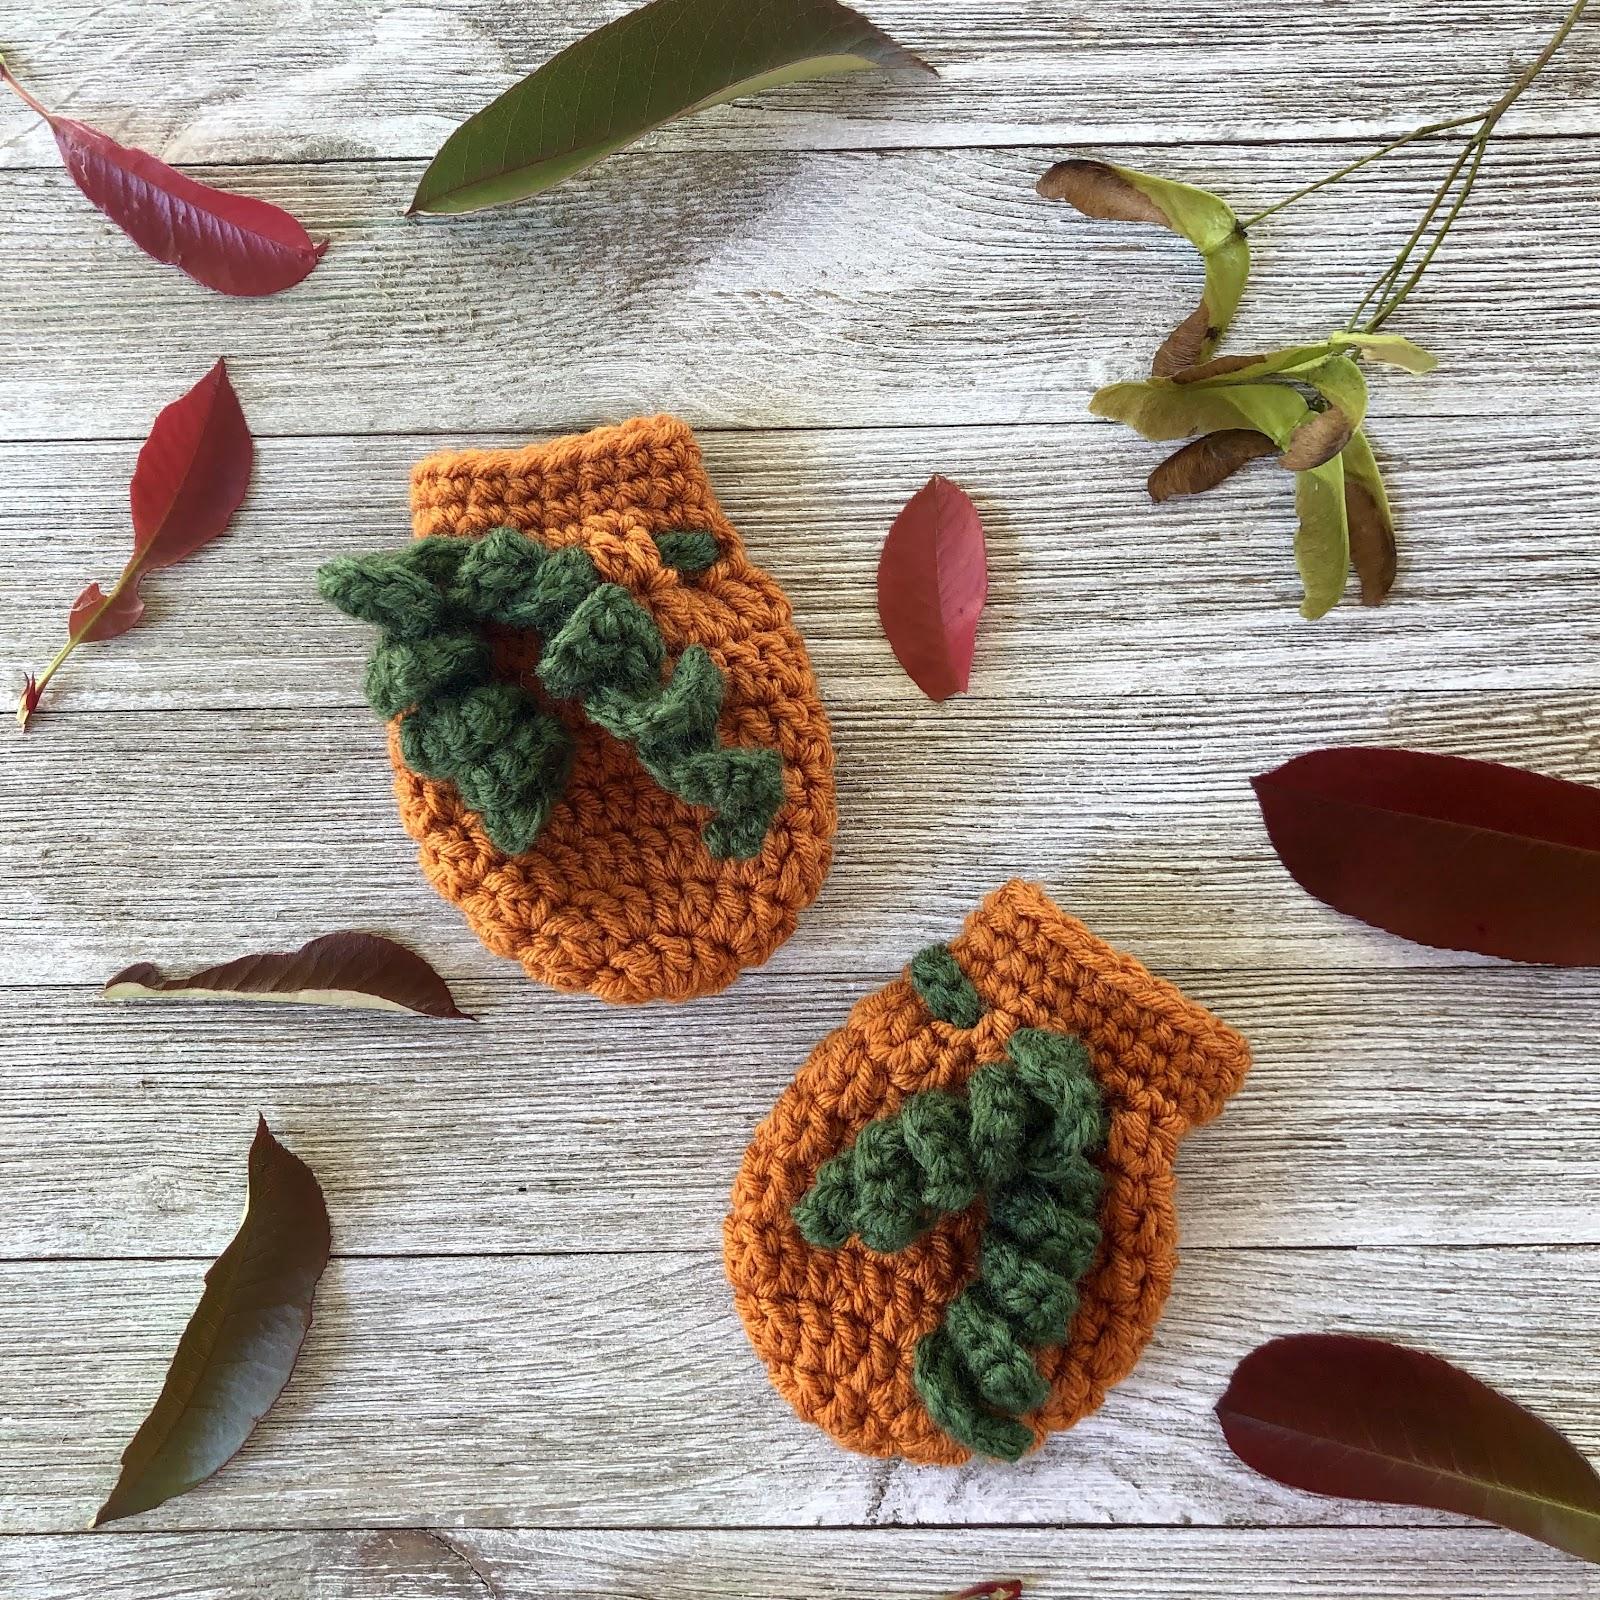 Crochet pumpkin baby mittens pattern by www.itchinforsomestitchin.com